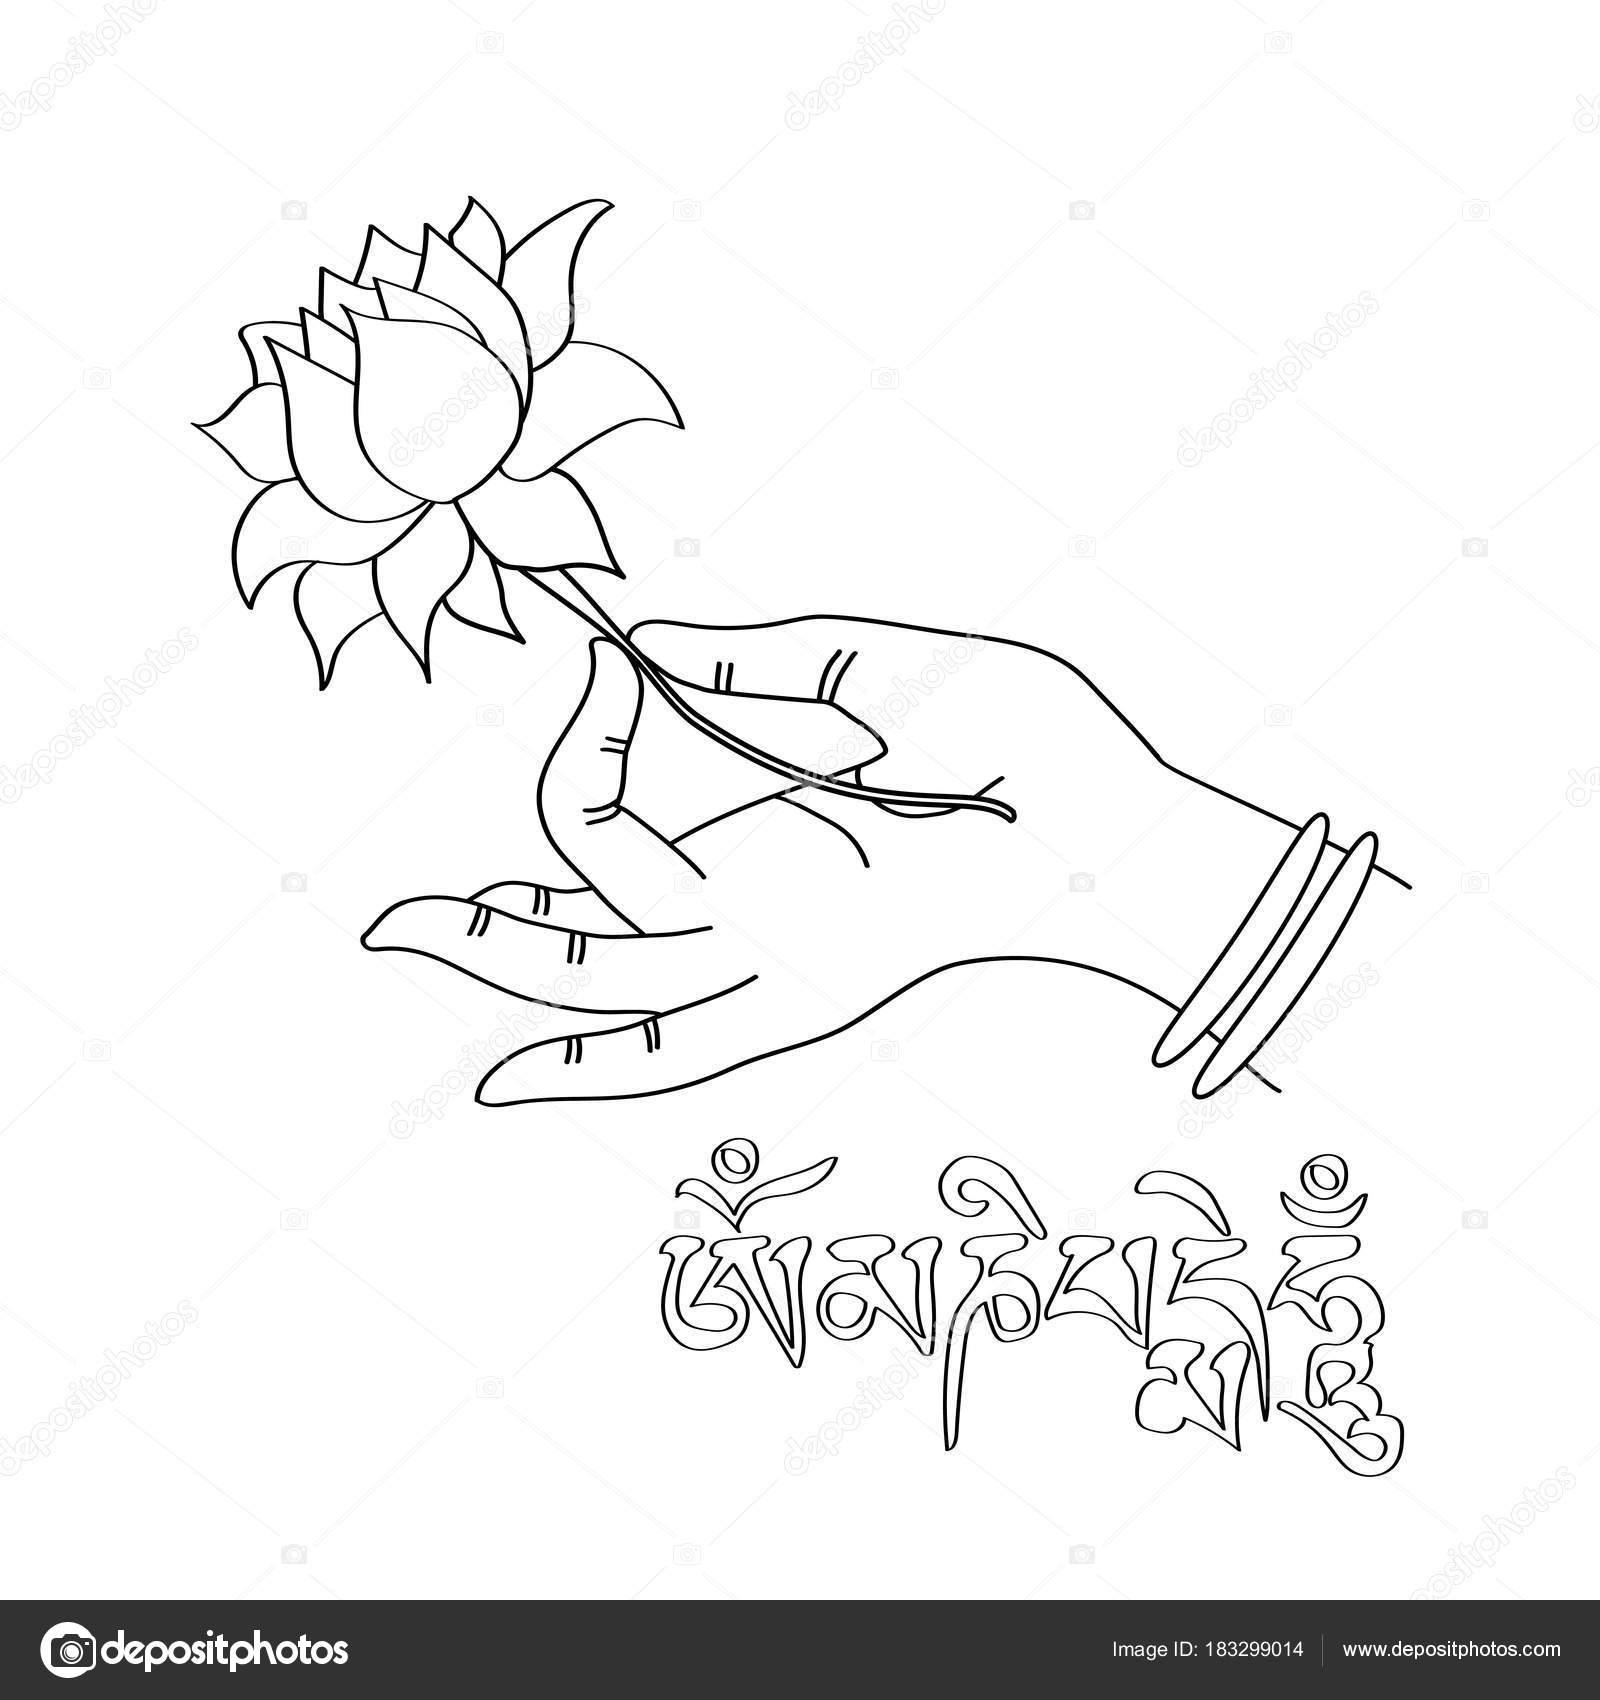 Hand drawn hand buddah lotus flower sanskrit mantra mani padme hand drawn hand buddah lotus flower sanskrit mantra mani padme stock vector mightylinksfo